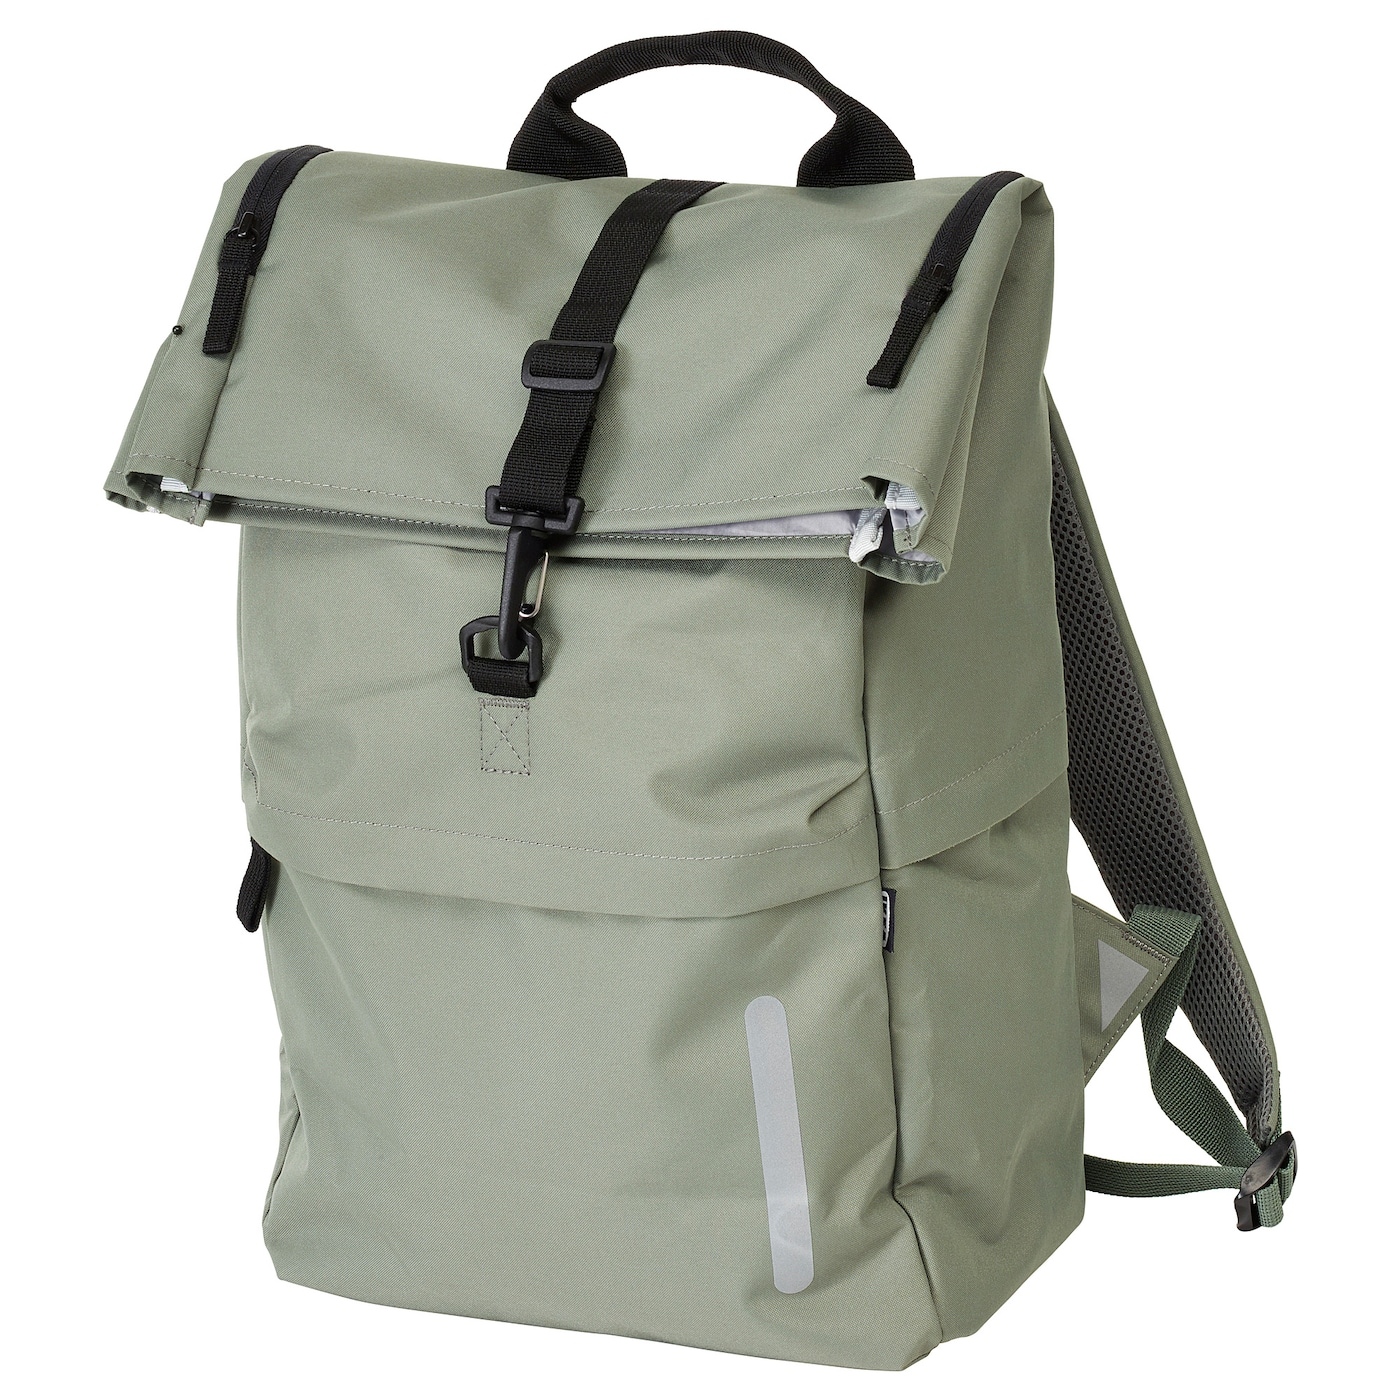 Ikea Travelbags Amp Backpacks Ikea Ireland Dublin